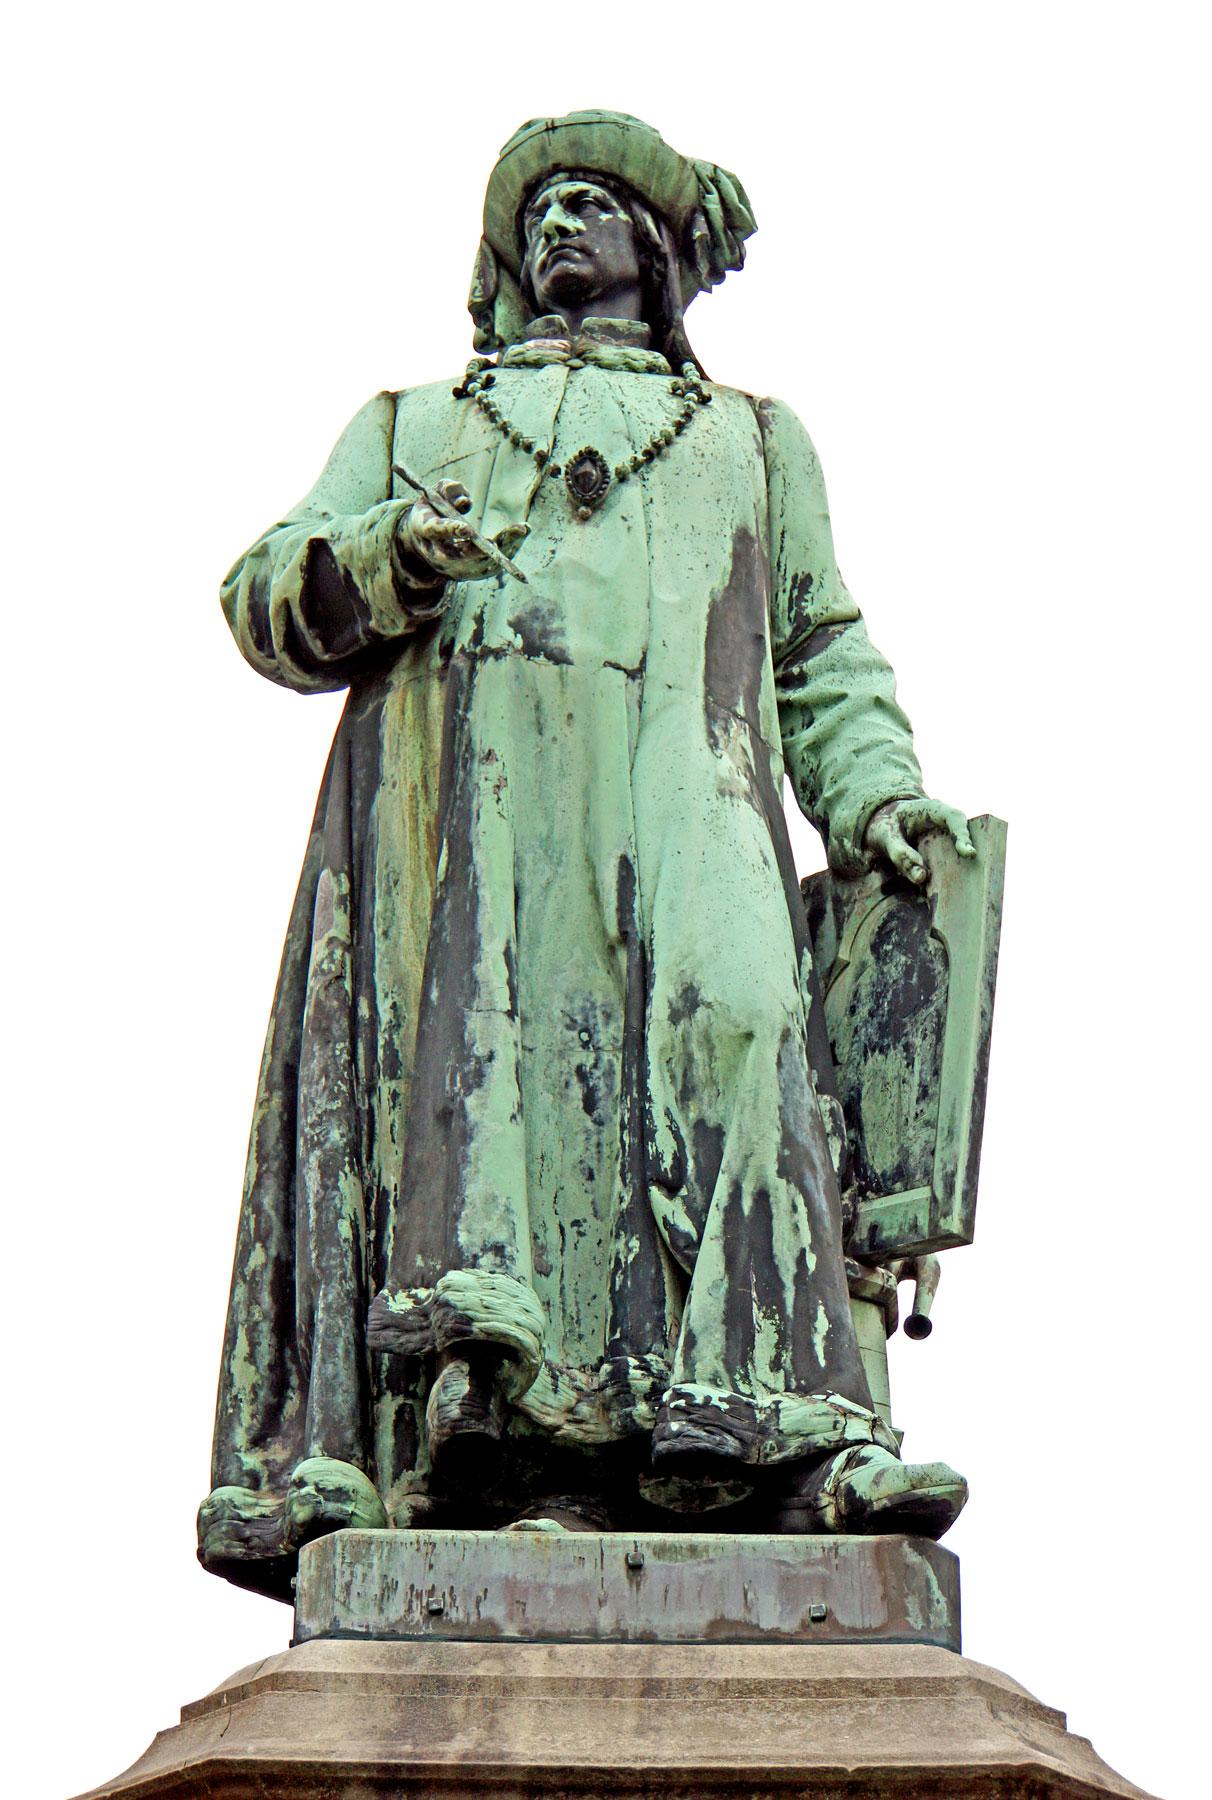 La statua di Jan van Eyck di Hendrik Pickery